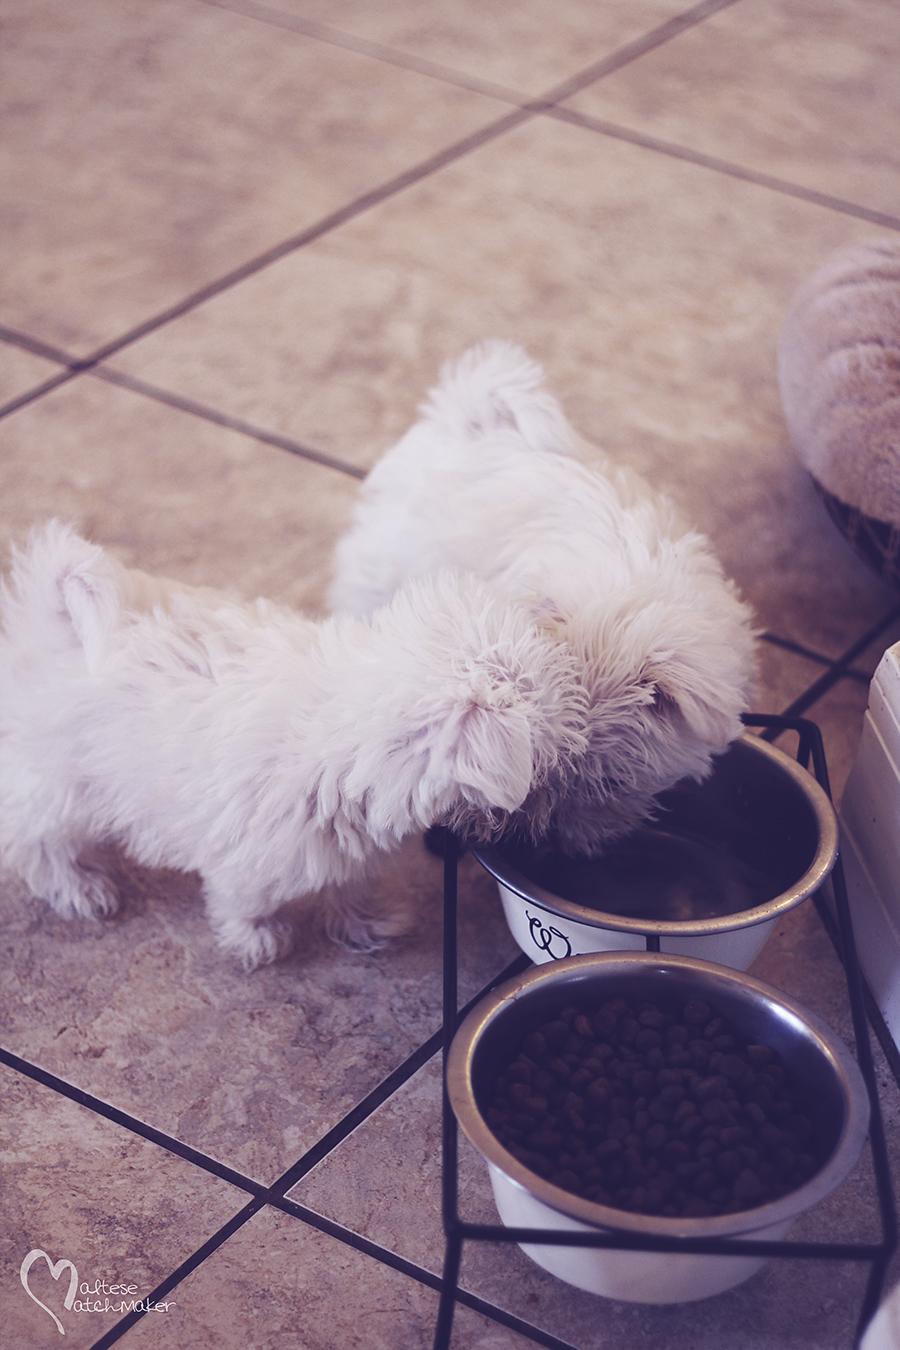 maltese puppies eating